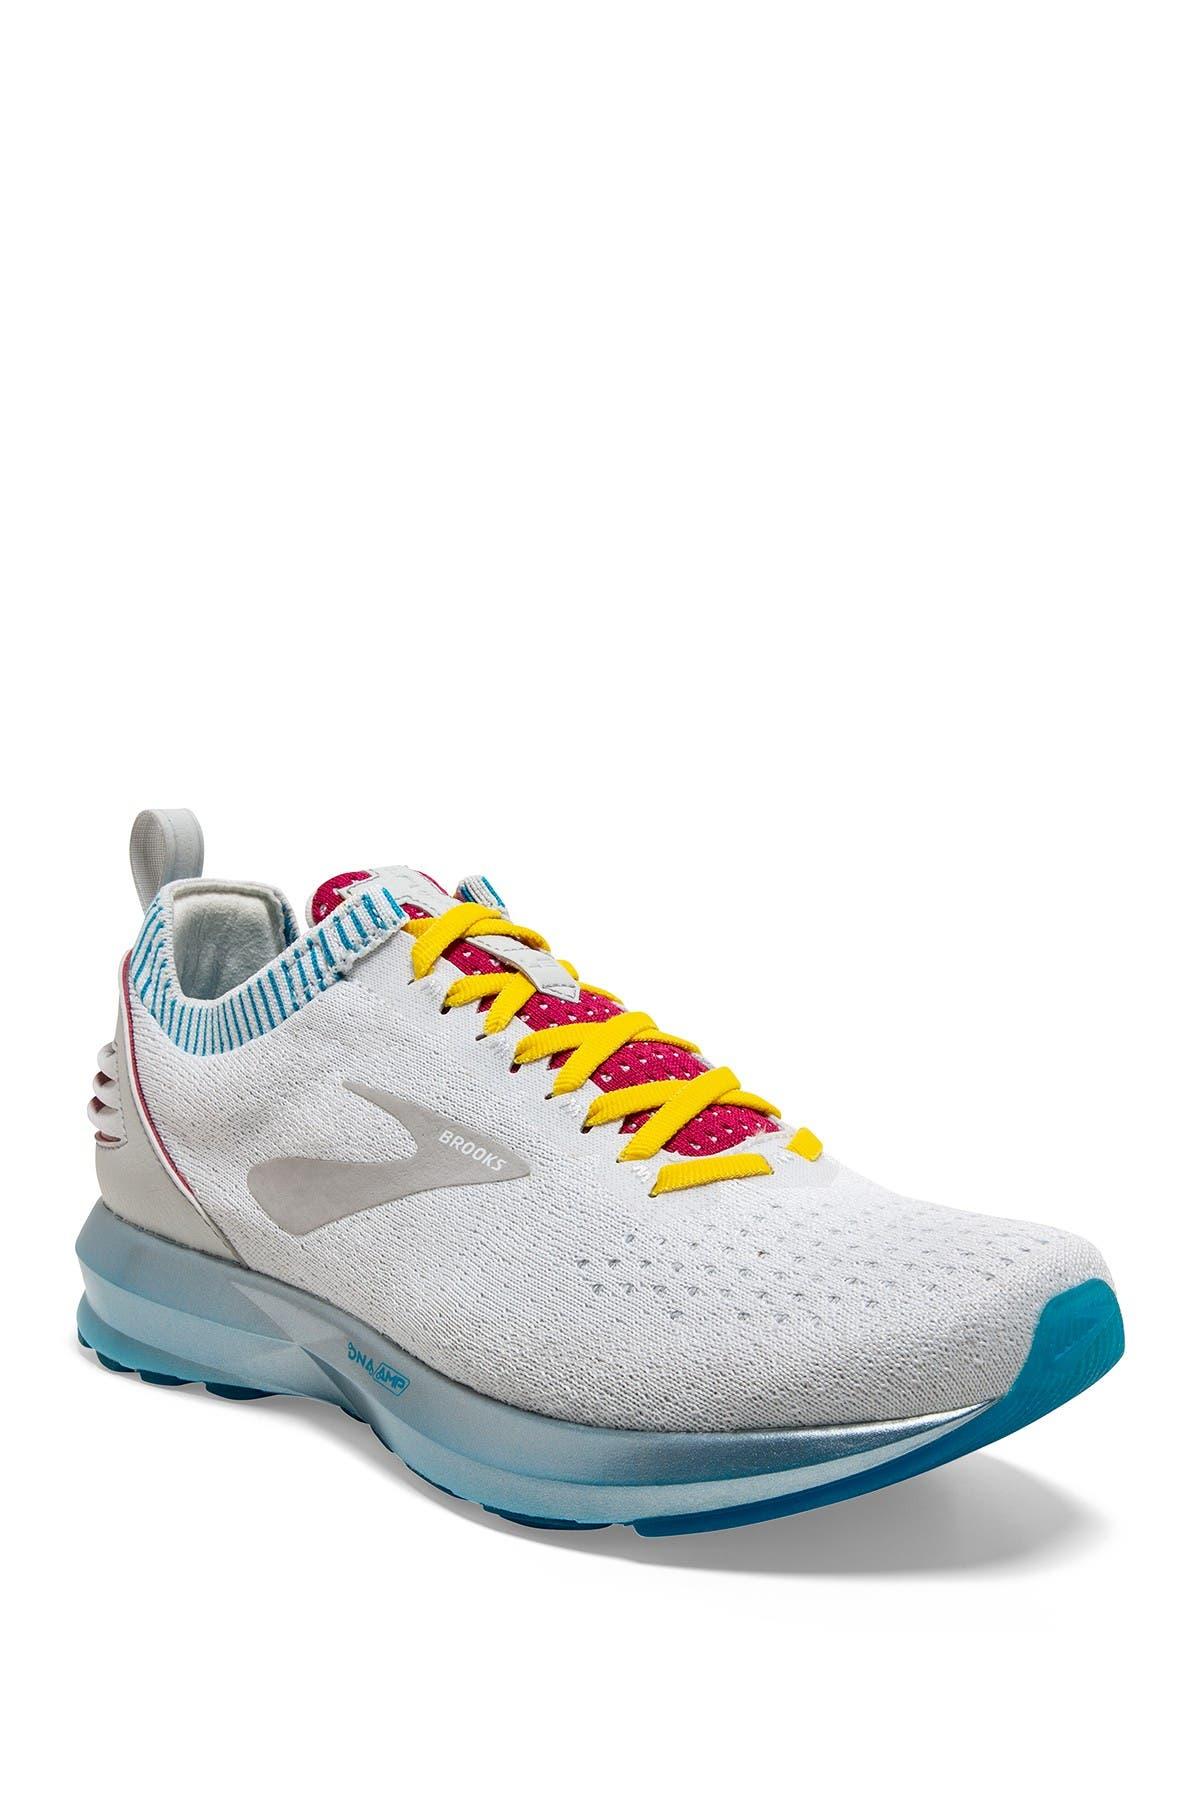 Brooks | Levitate 2 LE Running Sneaker